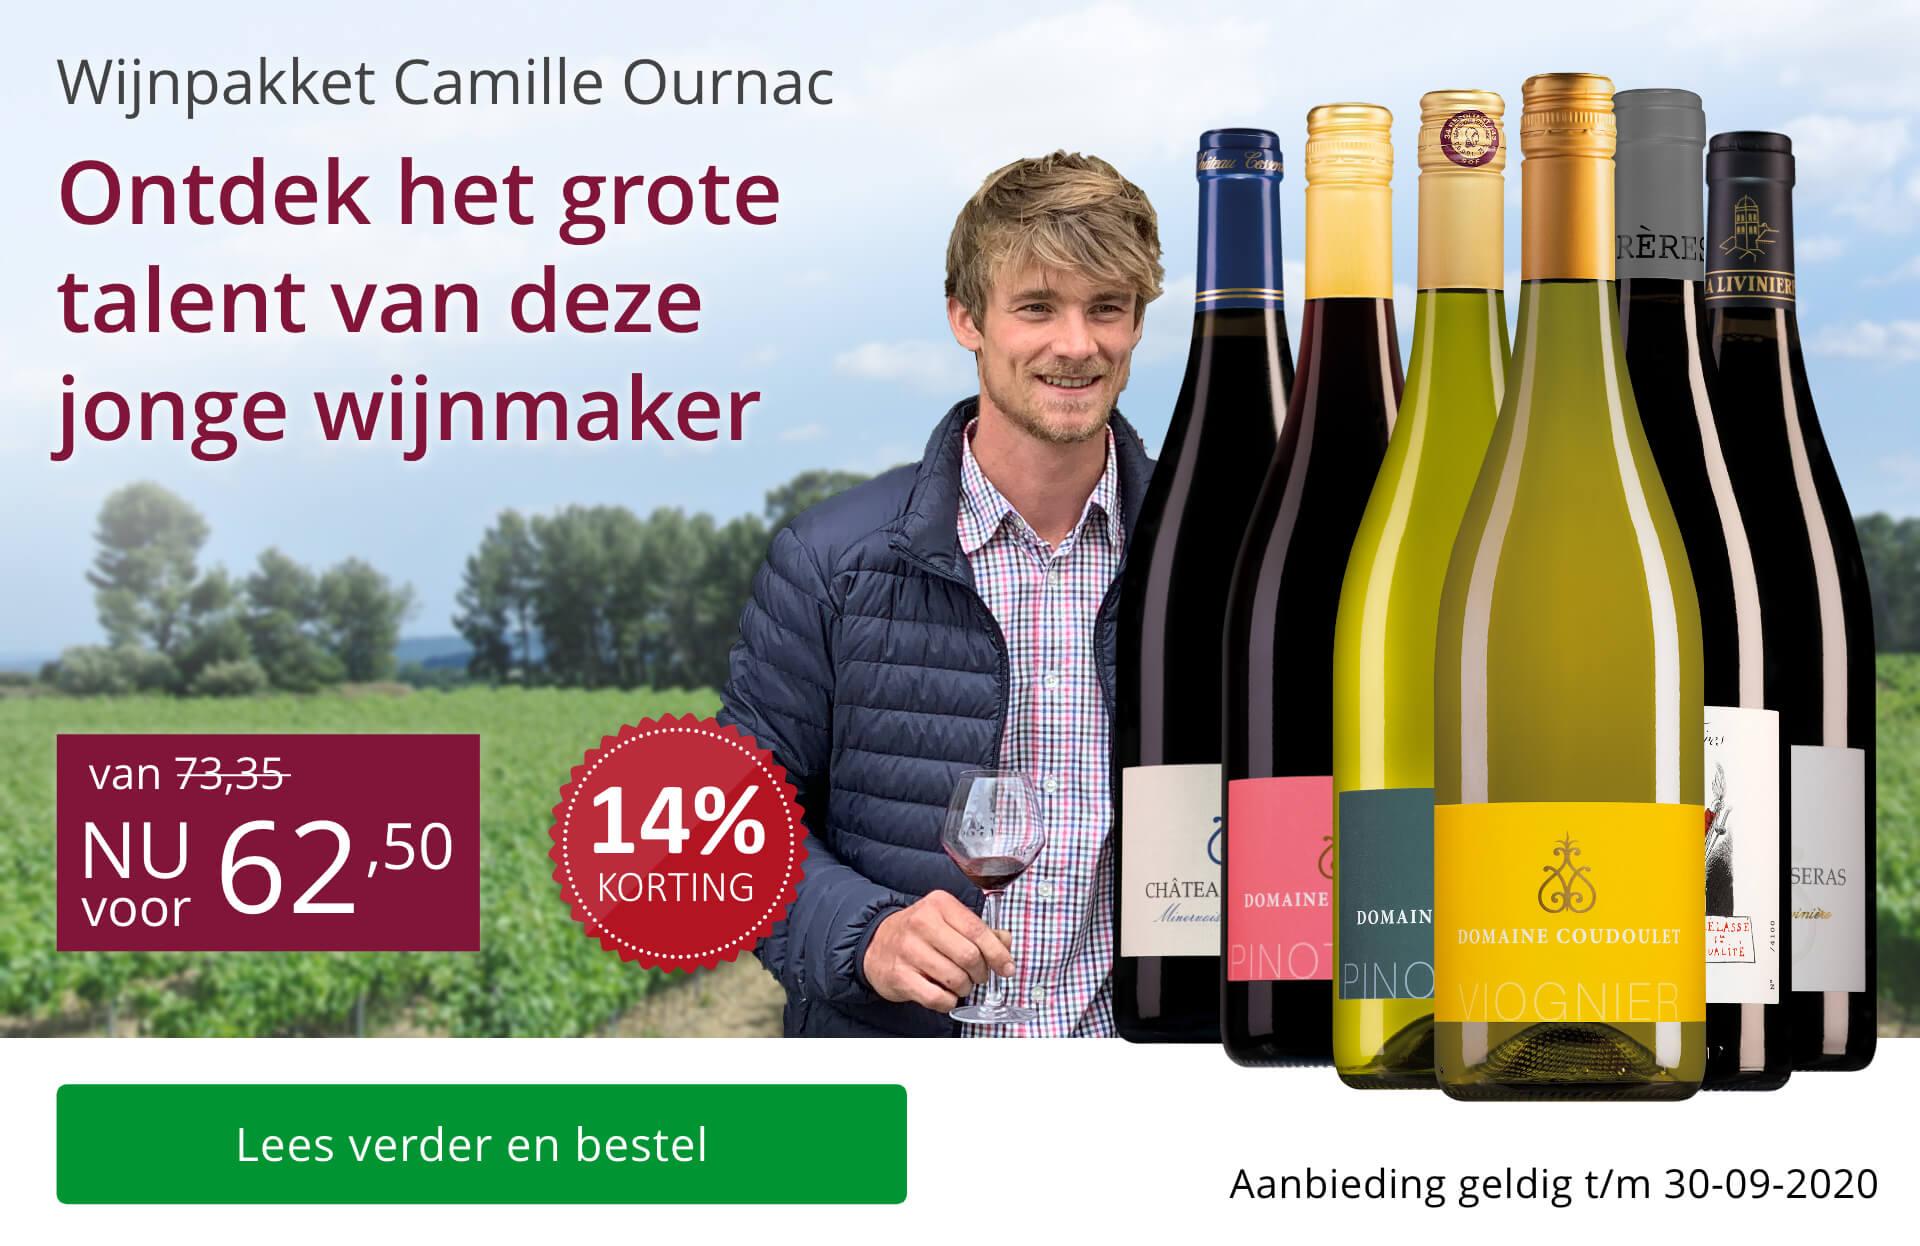 Wijnpakket Camille Ournac (62,50) - paars